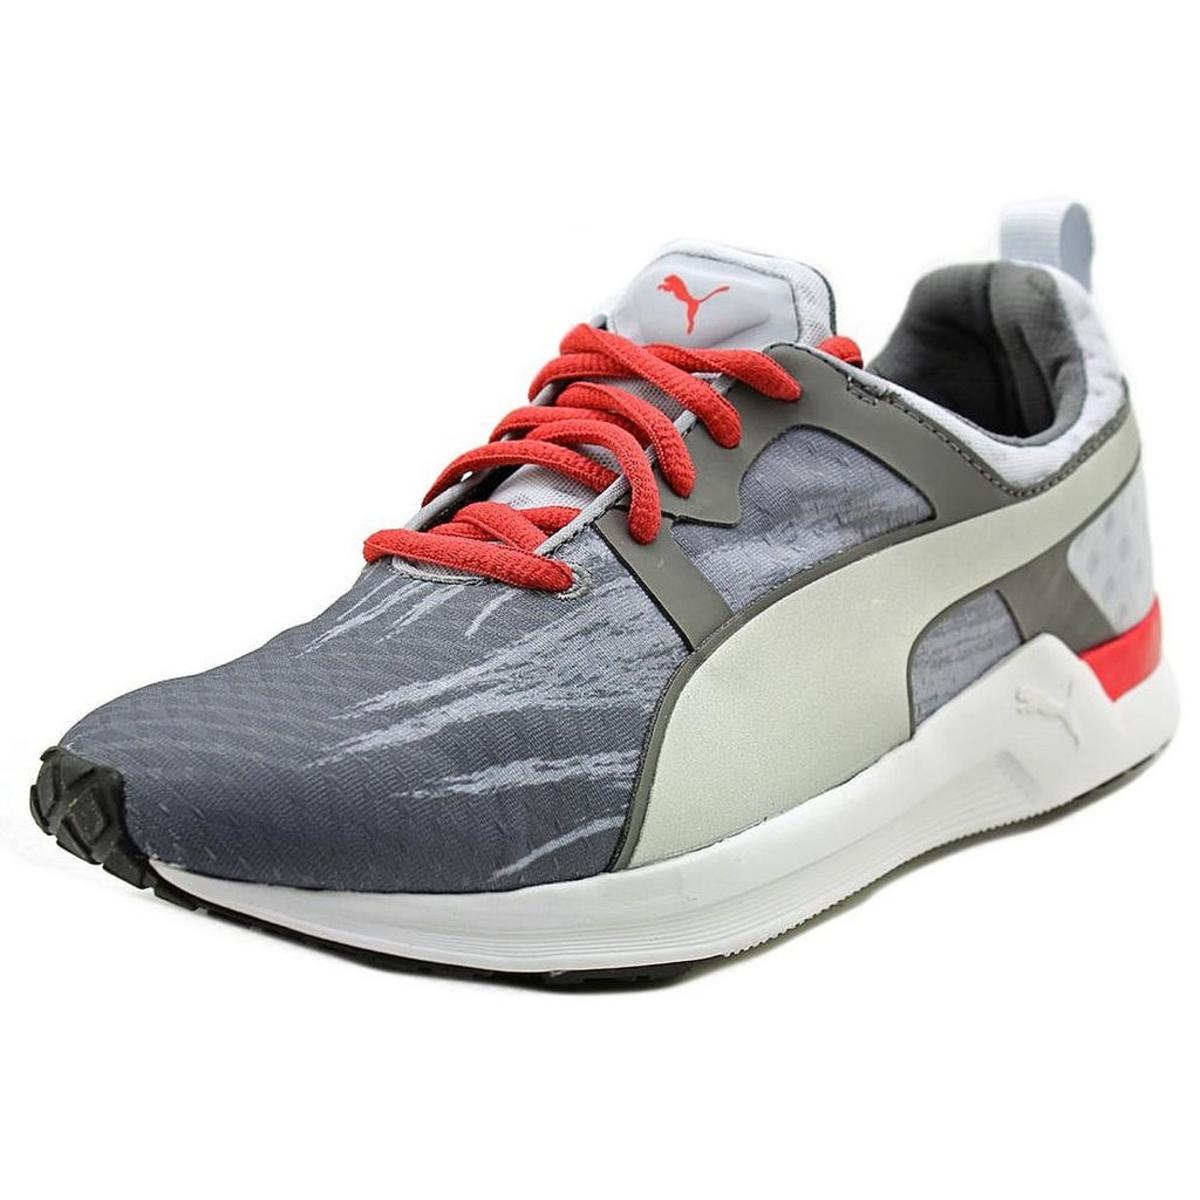 PUMA Women/'s Pulse XT Fade Running Shoe Gray//Geranium Size 9M